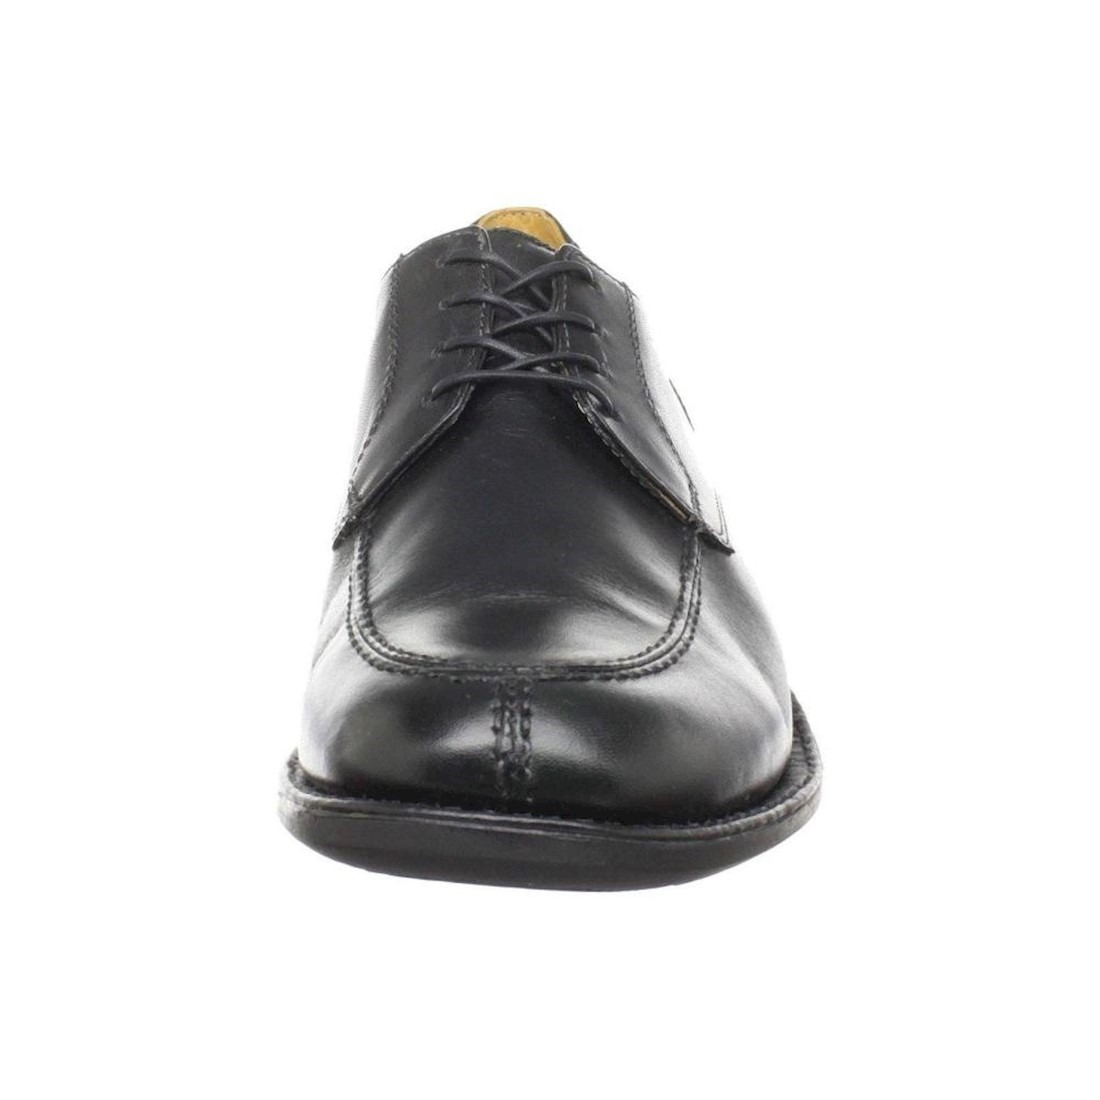 ed534f8af9 sapato social masculino derby sandro moscoloni wayne preto. Carregando zoom.